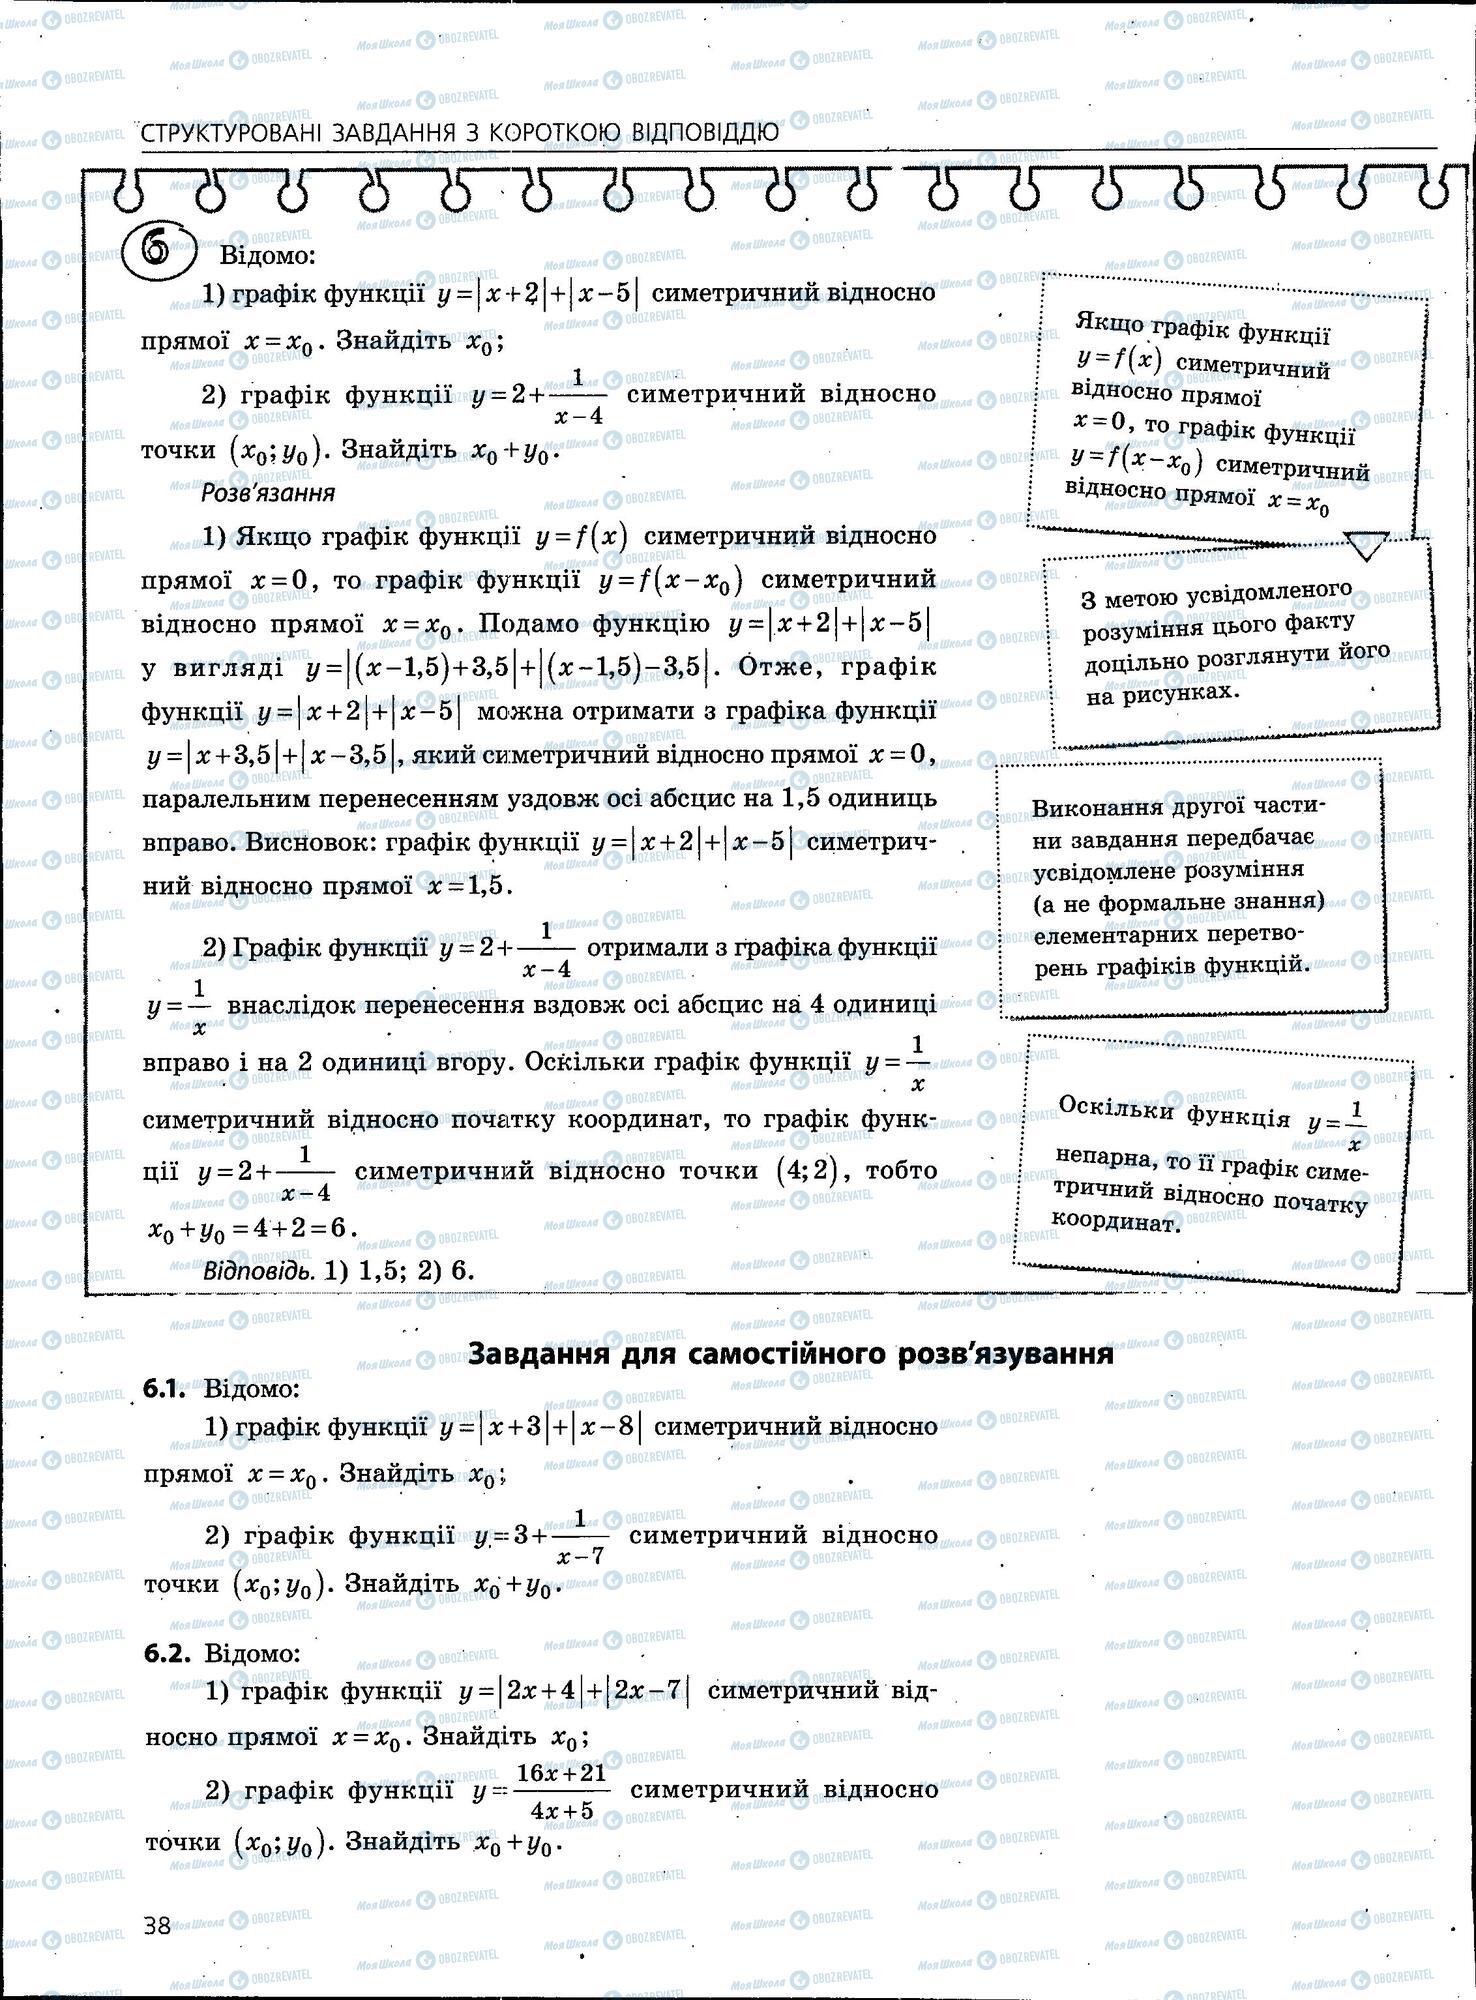 ЗНО Математика 11 класс страница 38